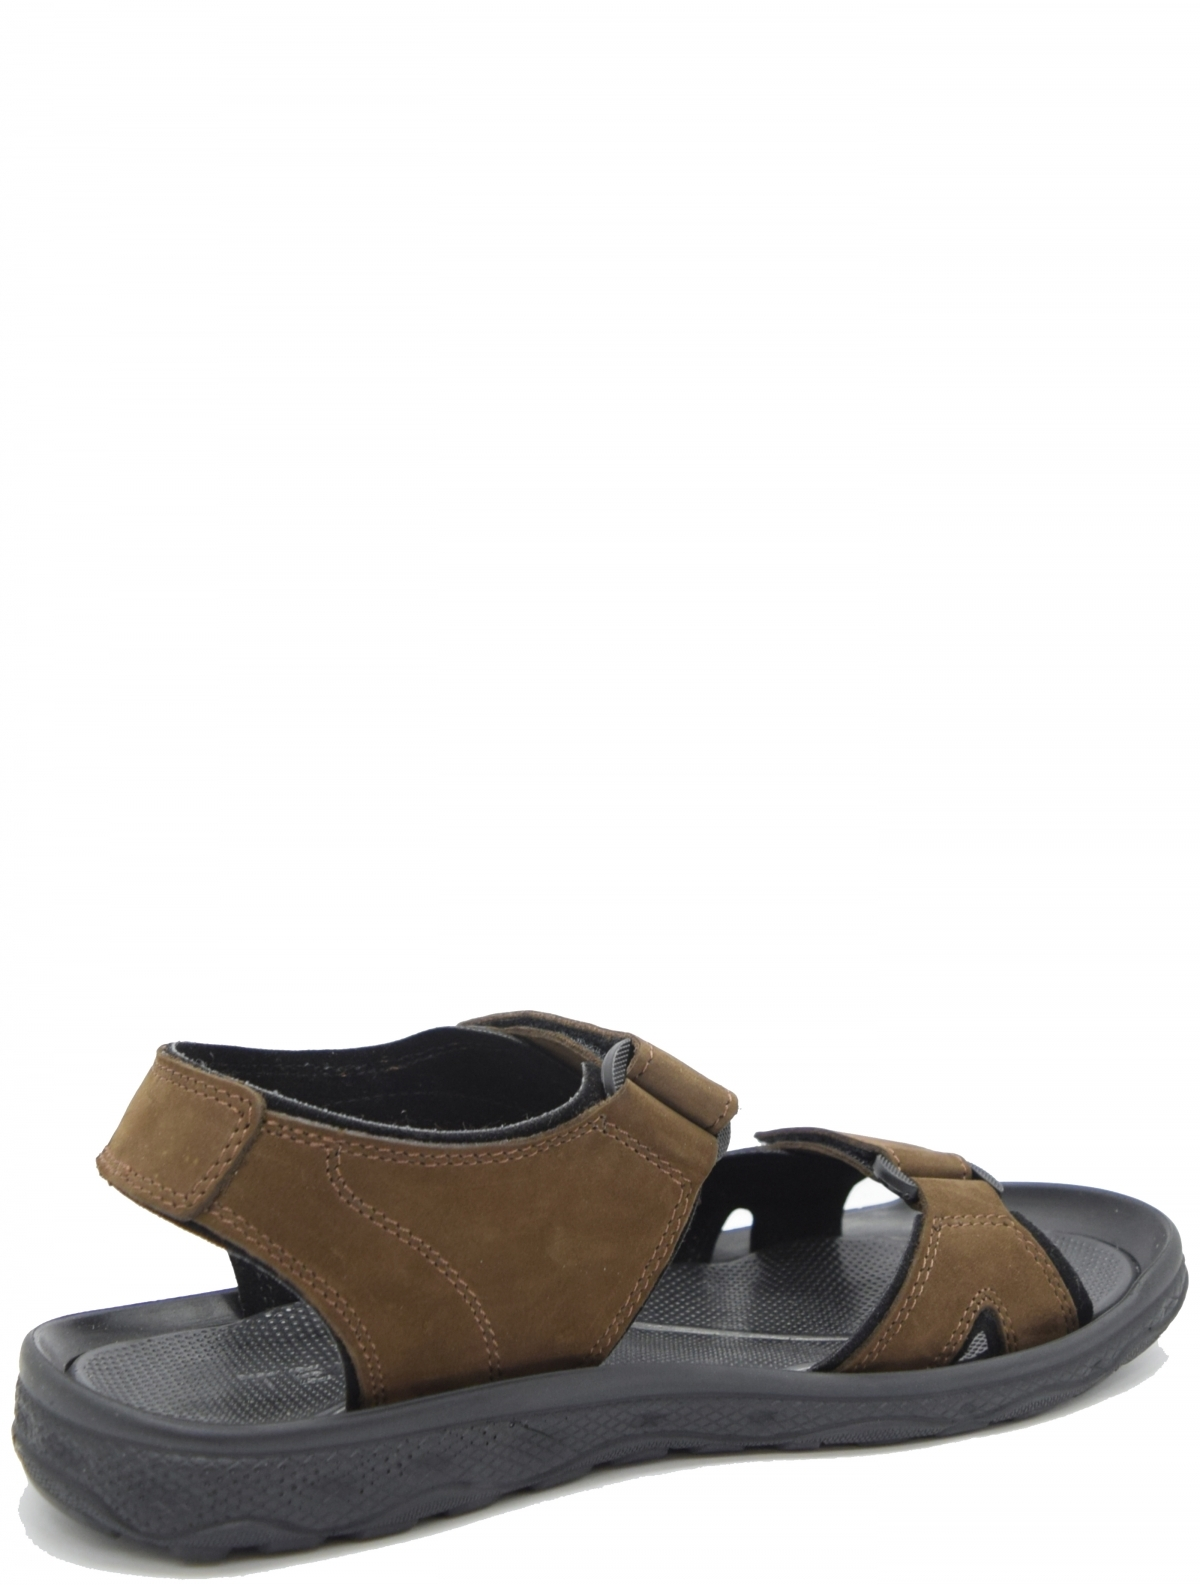 Rooman 901-054-Z2 мужские сандали